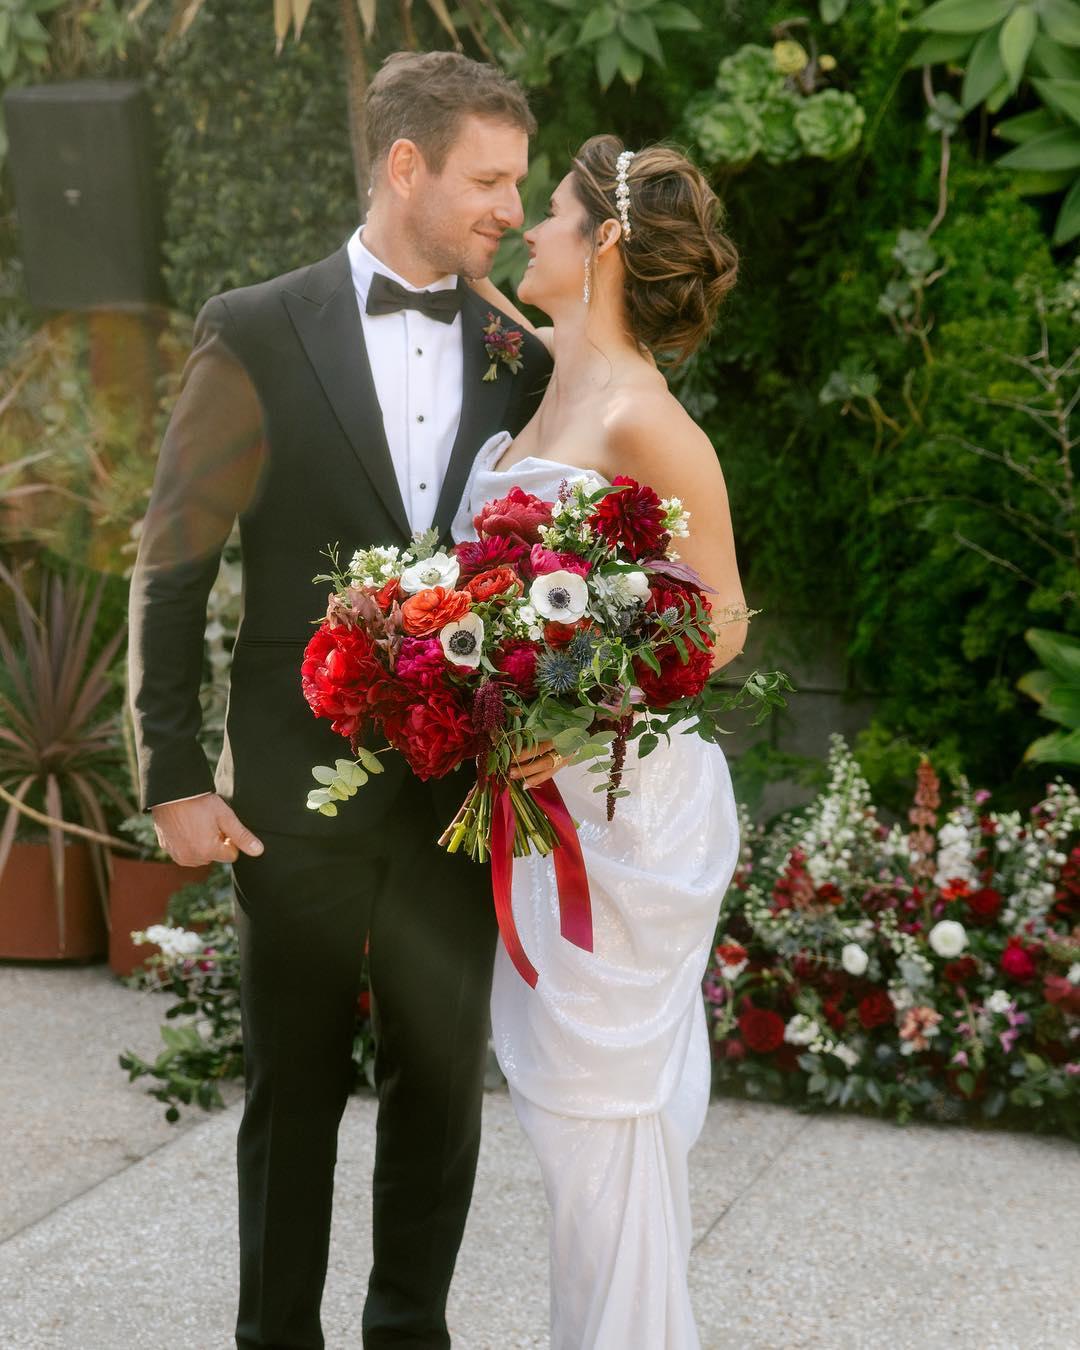 MISSY_PEREGRYM_WEDDING_PEOPLE.jpeg